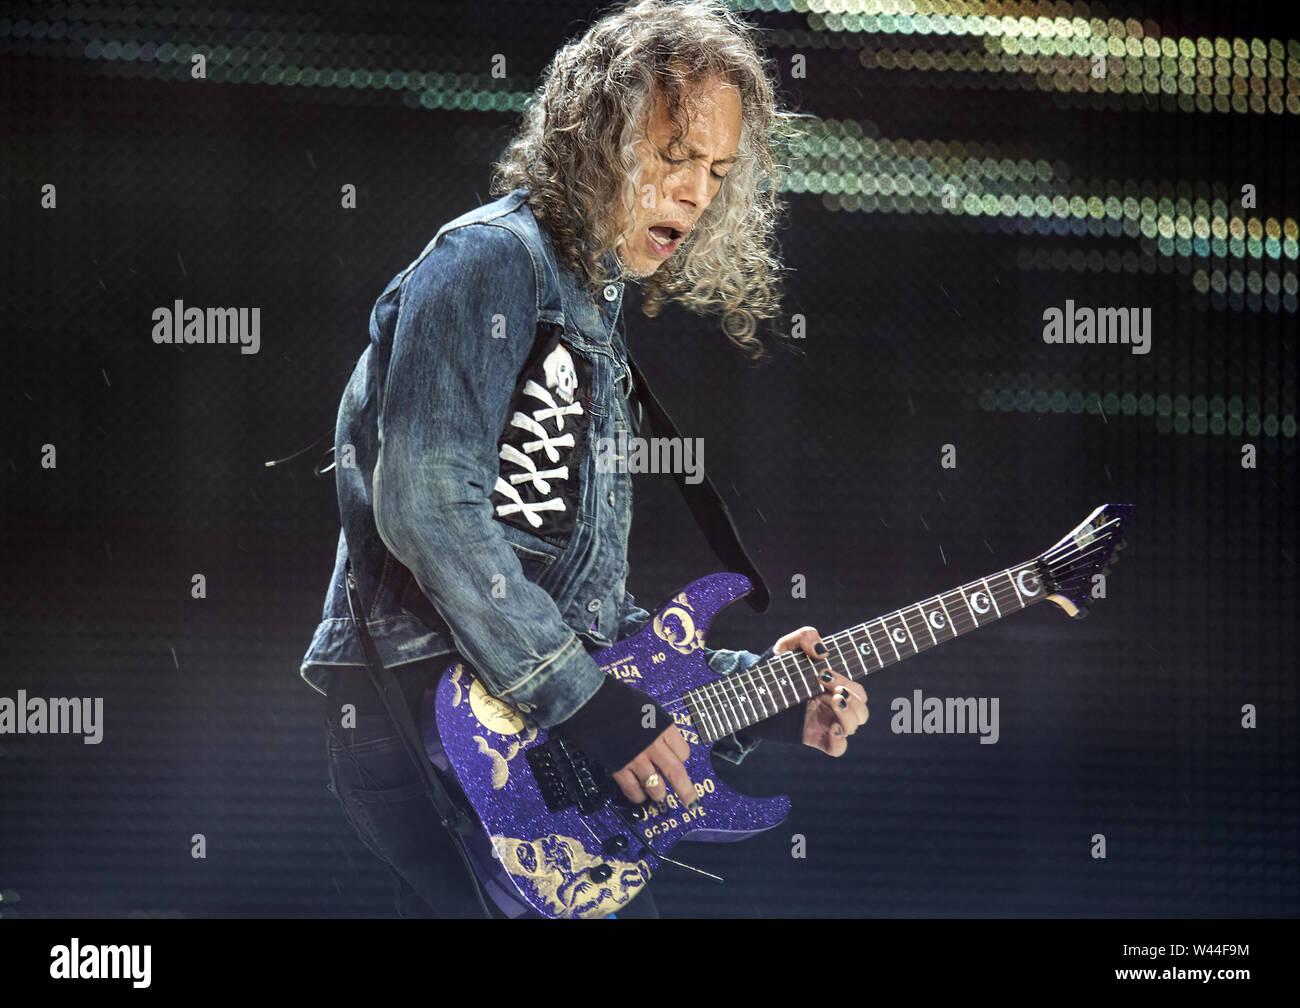 Metallica Performing On Their Worldwired Tour 2019 at Manchester Etihad Stadium Featuring: Metallica, Kirk Hammett Where: Manchester, United Kingdom When: 18 Jun 2019 Credit: Sakura/WENN.com - Stock Image